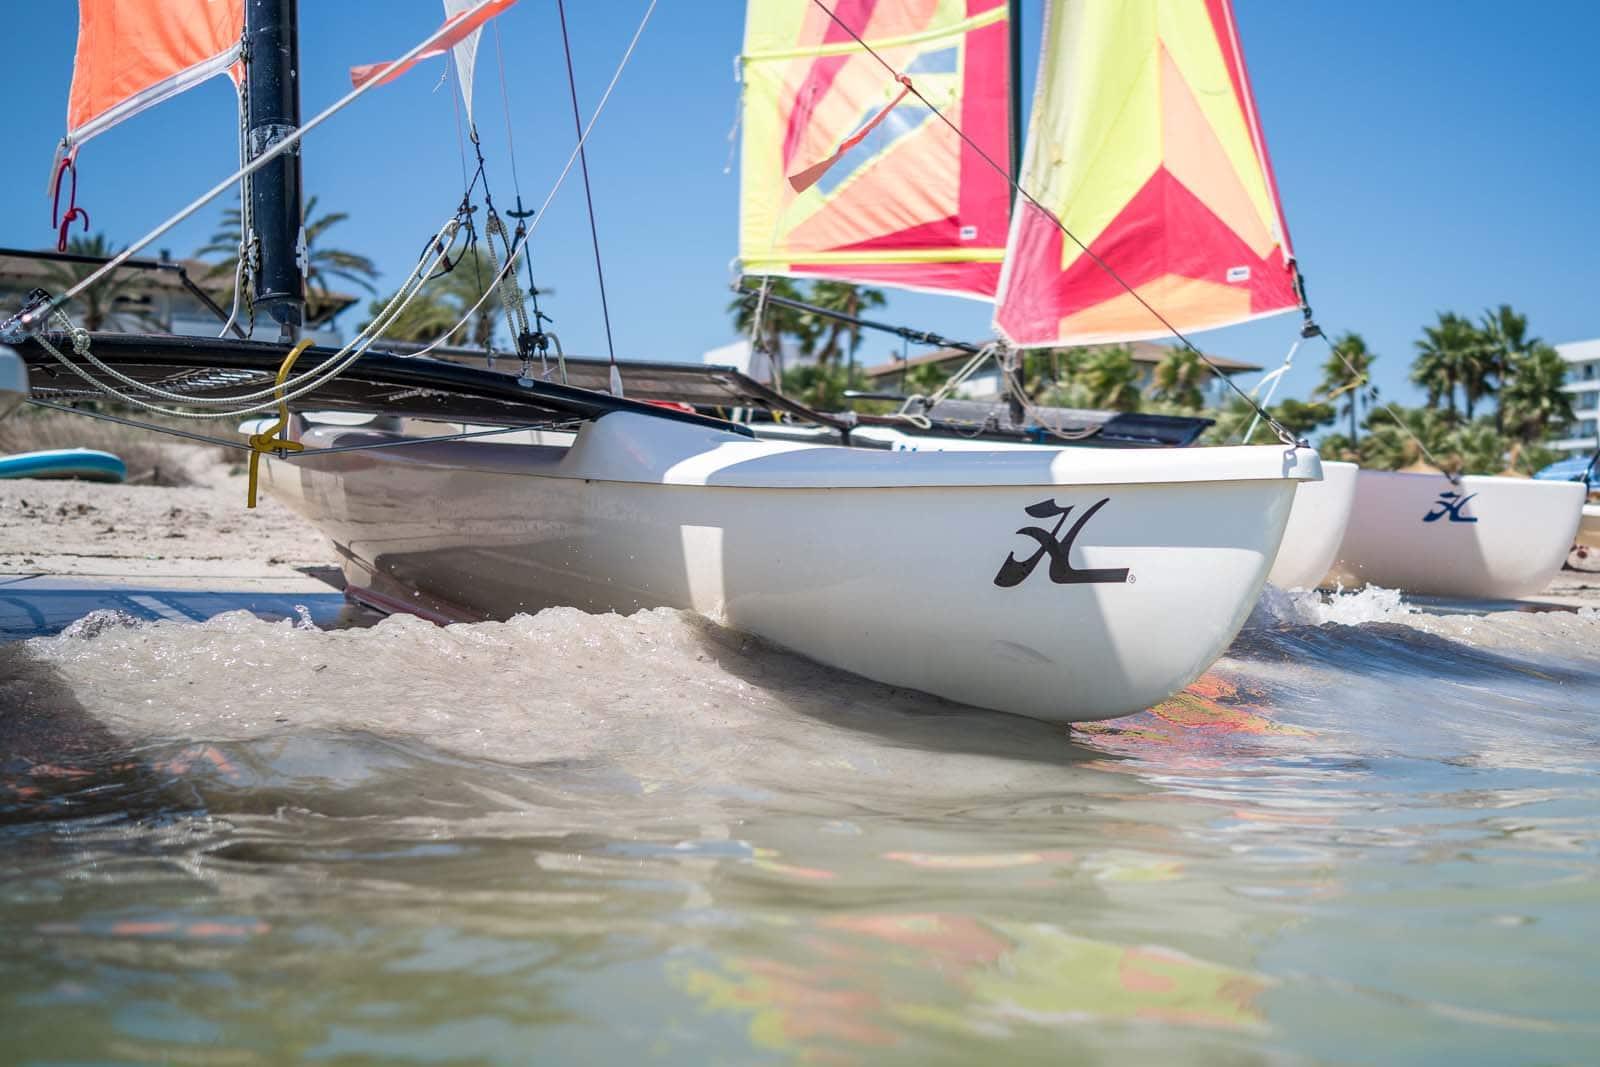 alquiler catamaran mallorca en la bahia de alcudia - Facilities